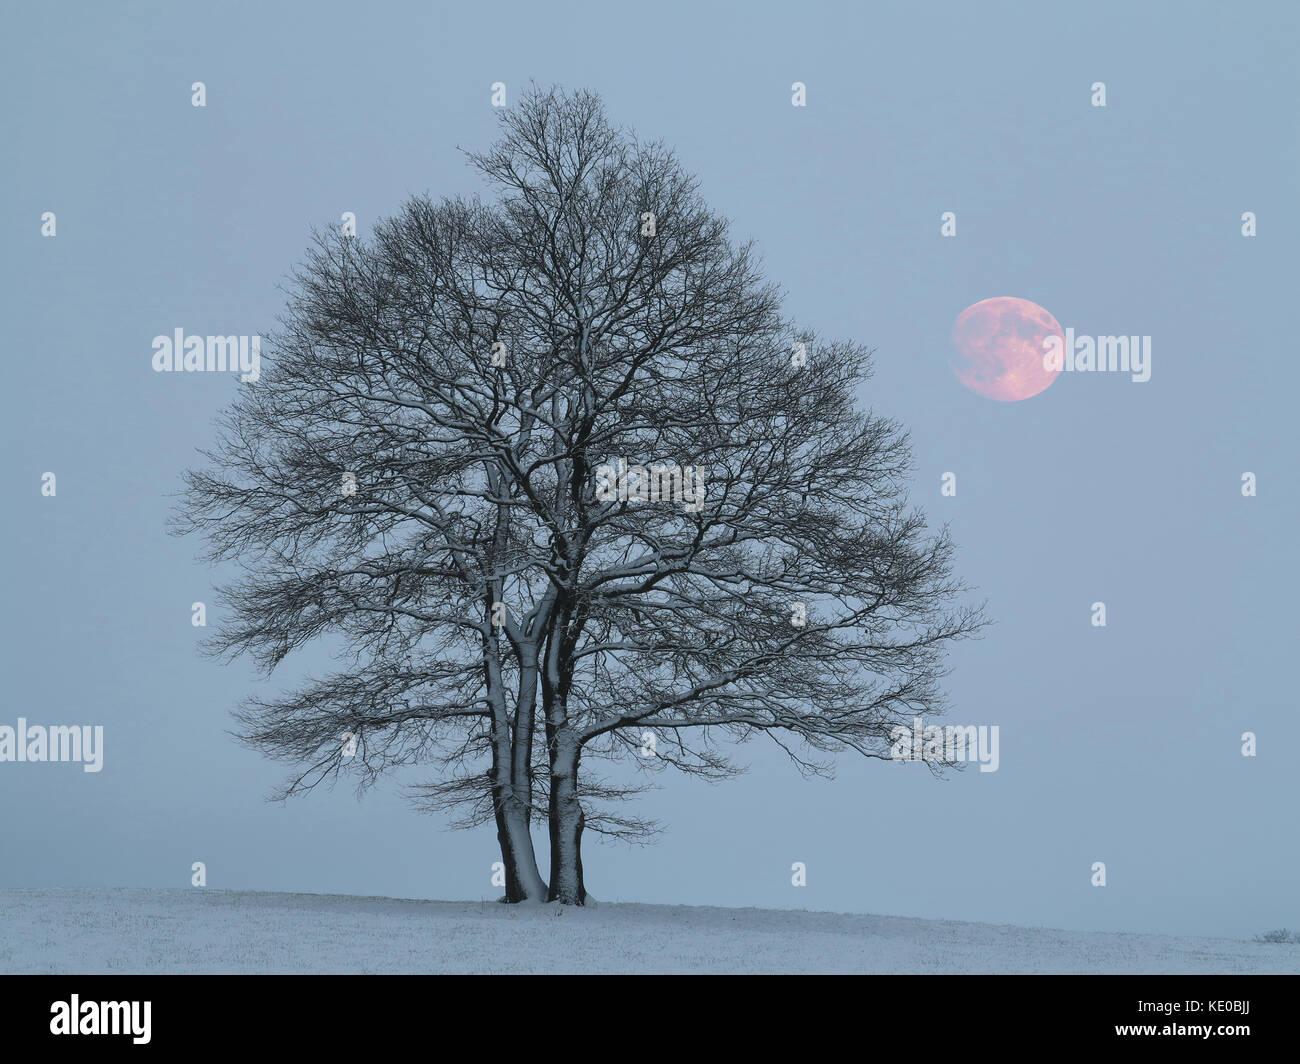 bald oak trees with full moon near sundern-hellefeld, hochsauerlandkreis, hochsauerland, sauerland, nrw, germany - Stock Image